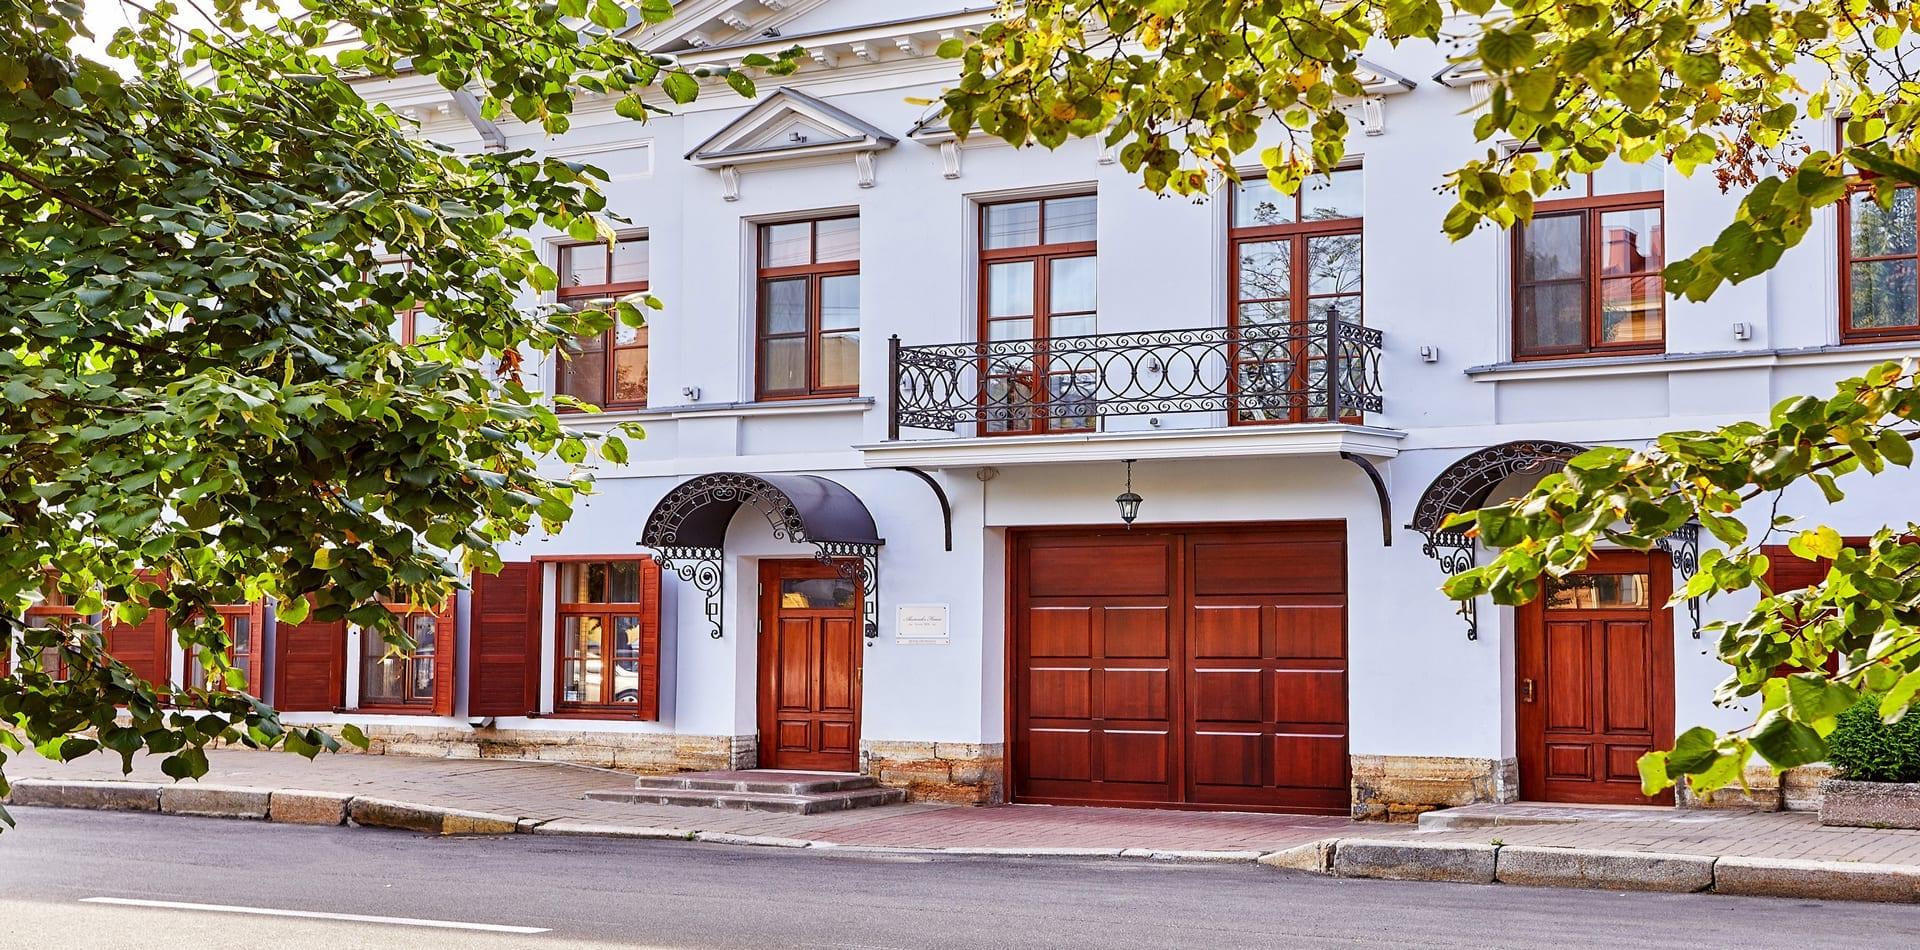 Exterior Street View of Alexander House St Petersburg Russia